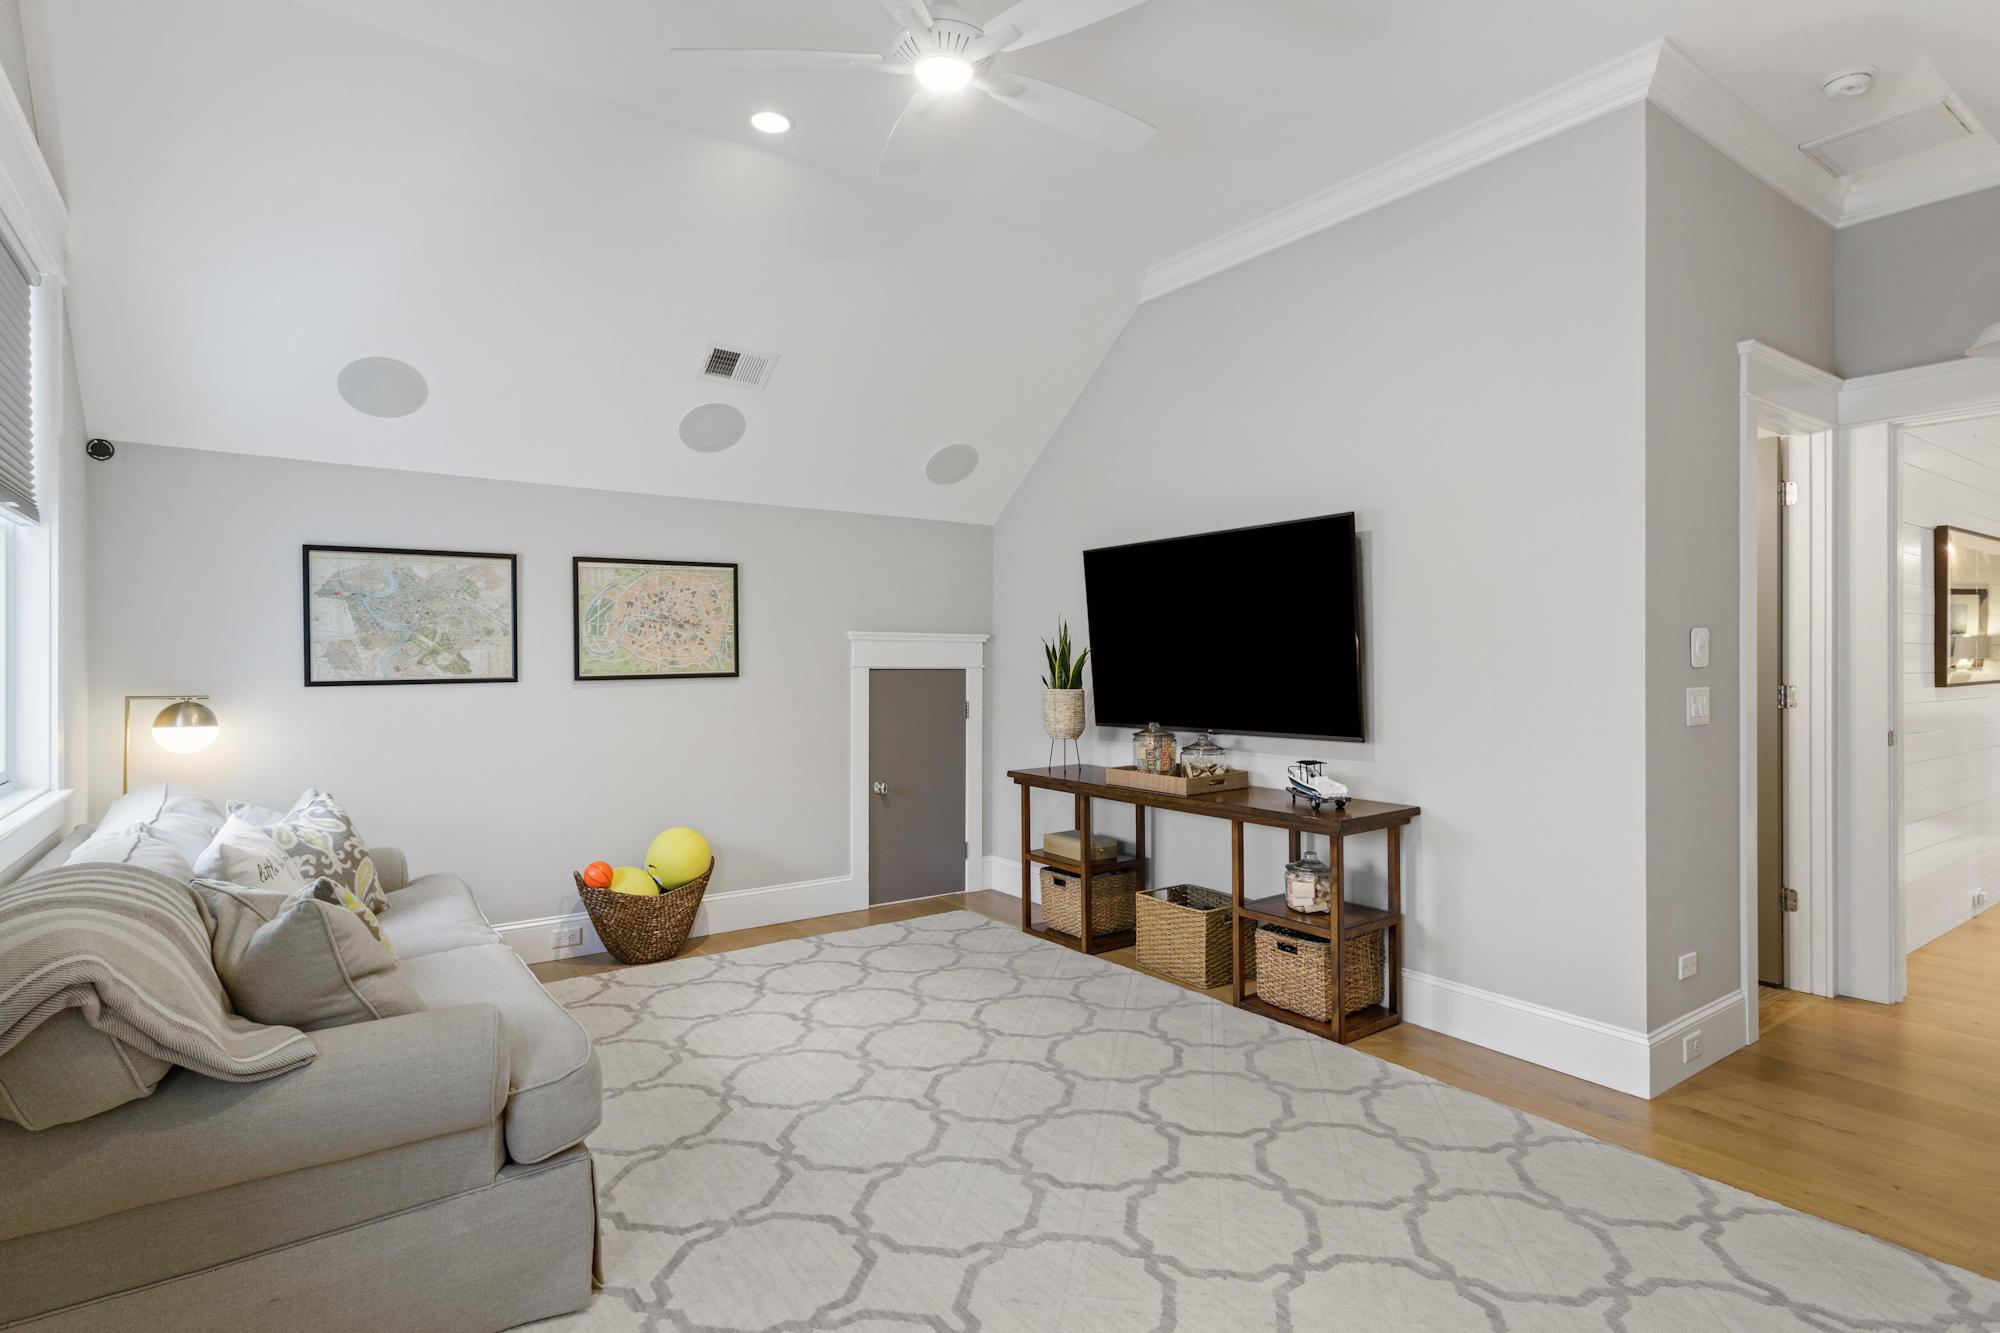 Daniel Island Park Homes For Sale - 458 Lesesne, Charleston, SC - 2